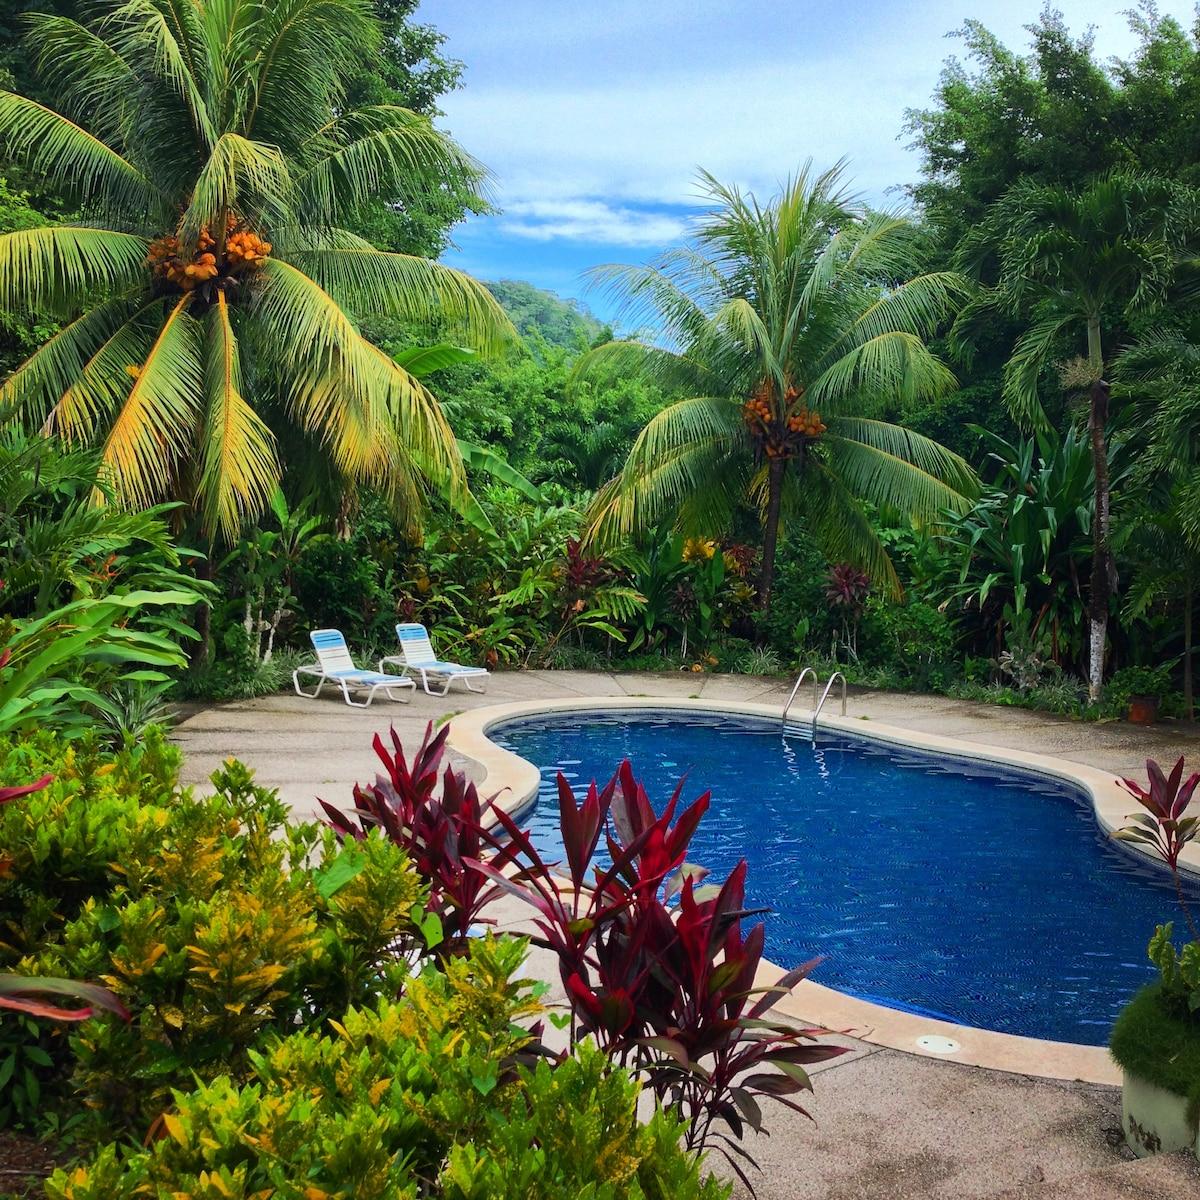 Jungle Lodge in Mal Pais